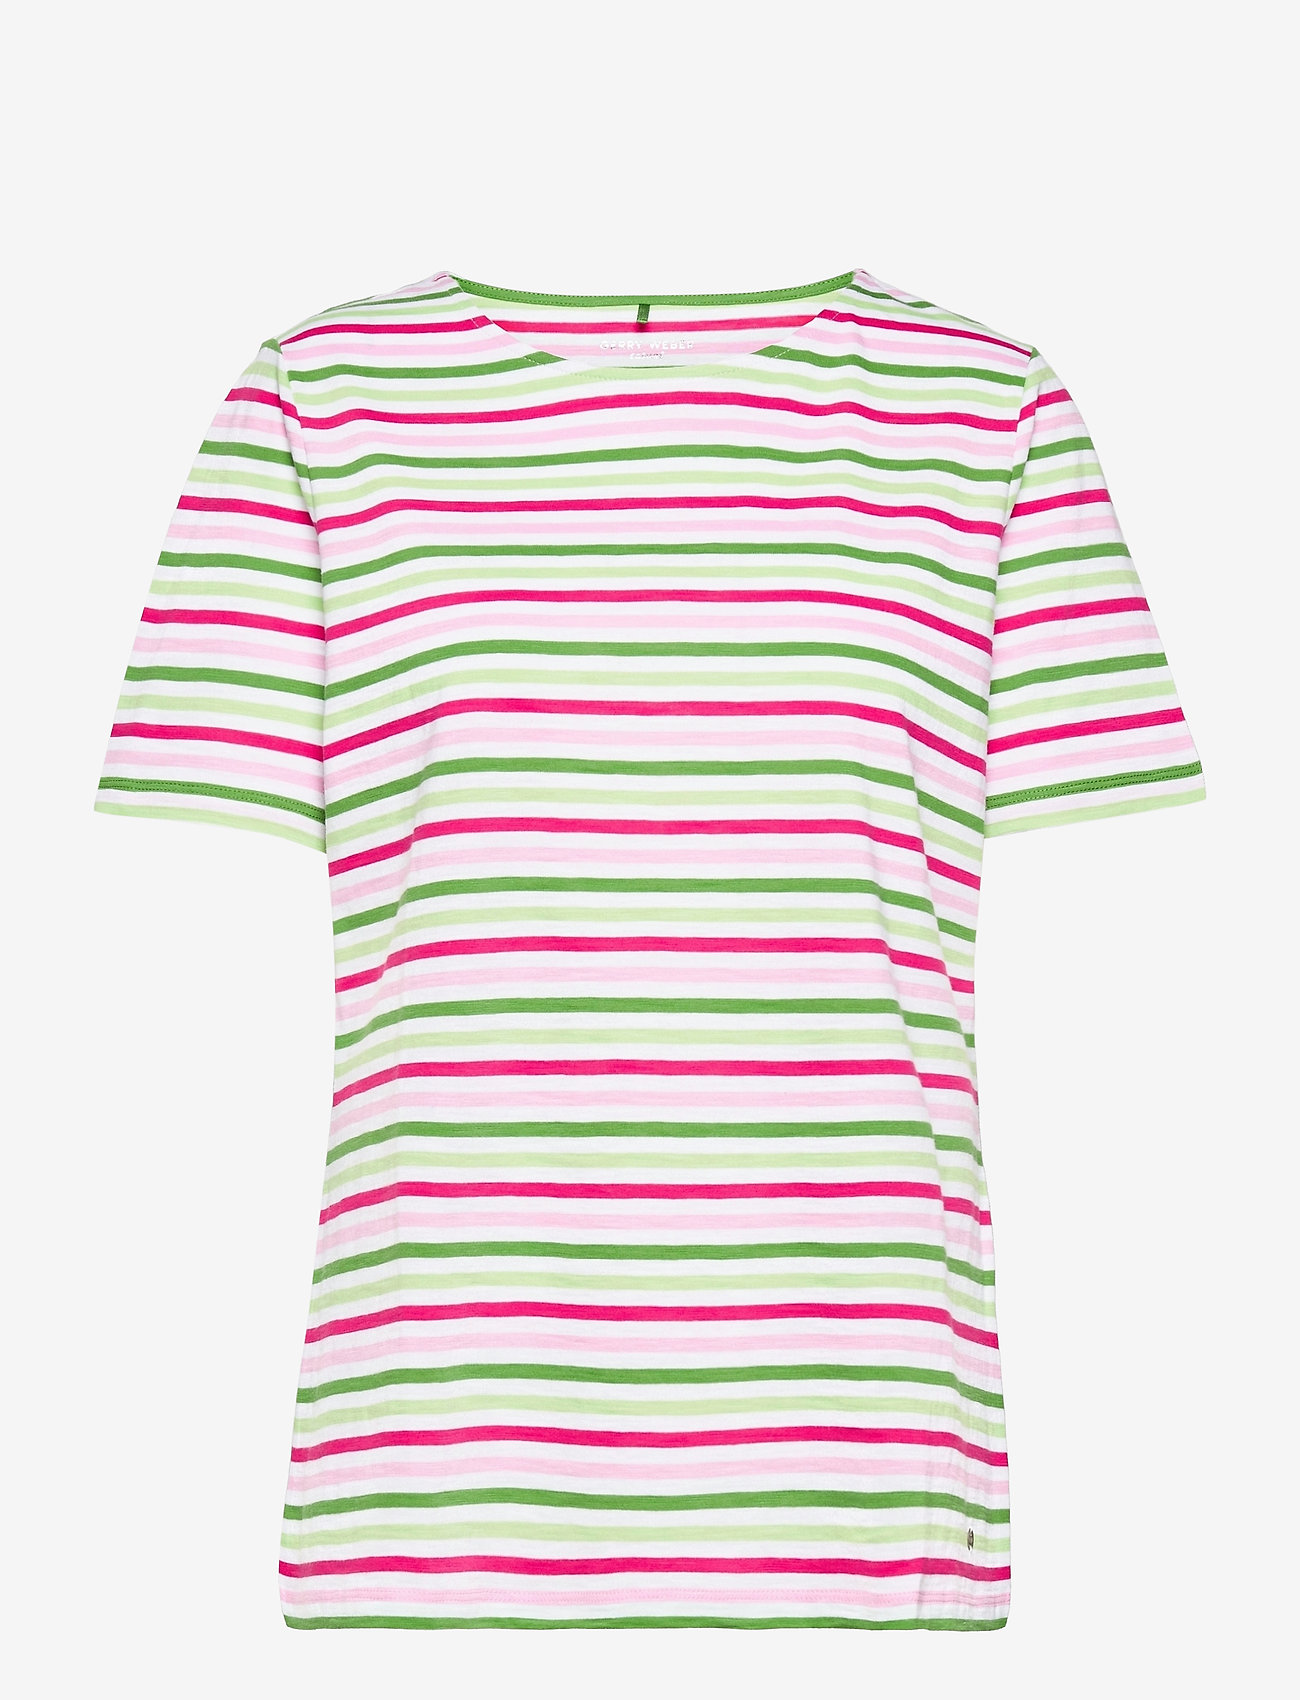 Gerry Weber Edition - T-SHIRT SHORT-SLEEVE - t-shirts - lilac/pink/green hoops - 0